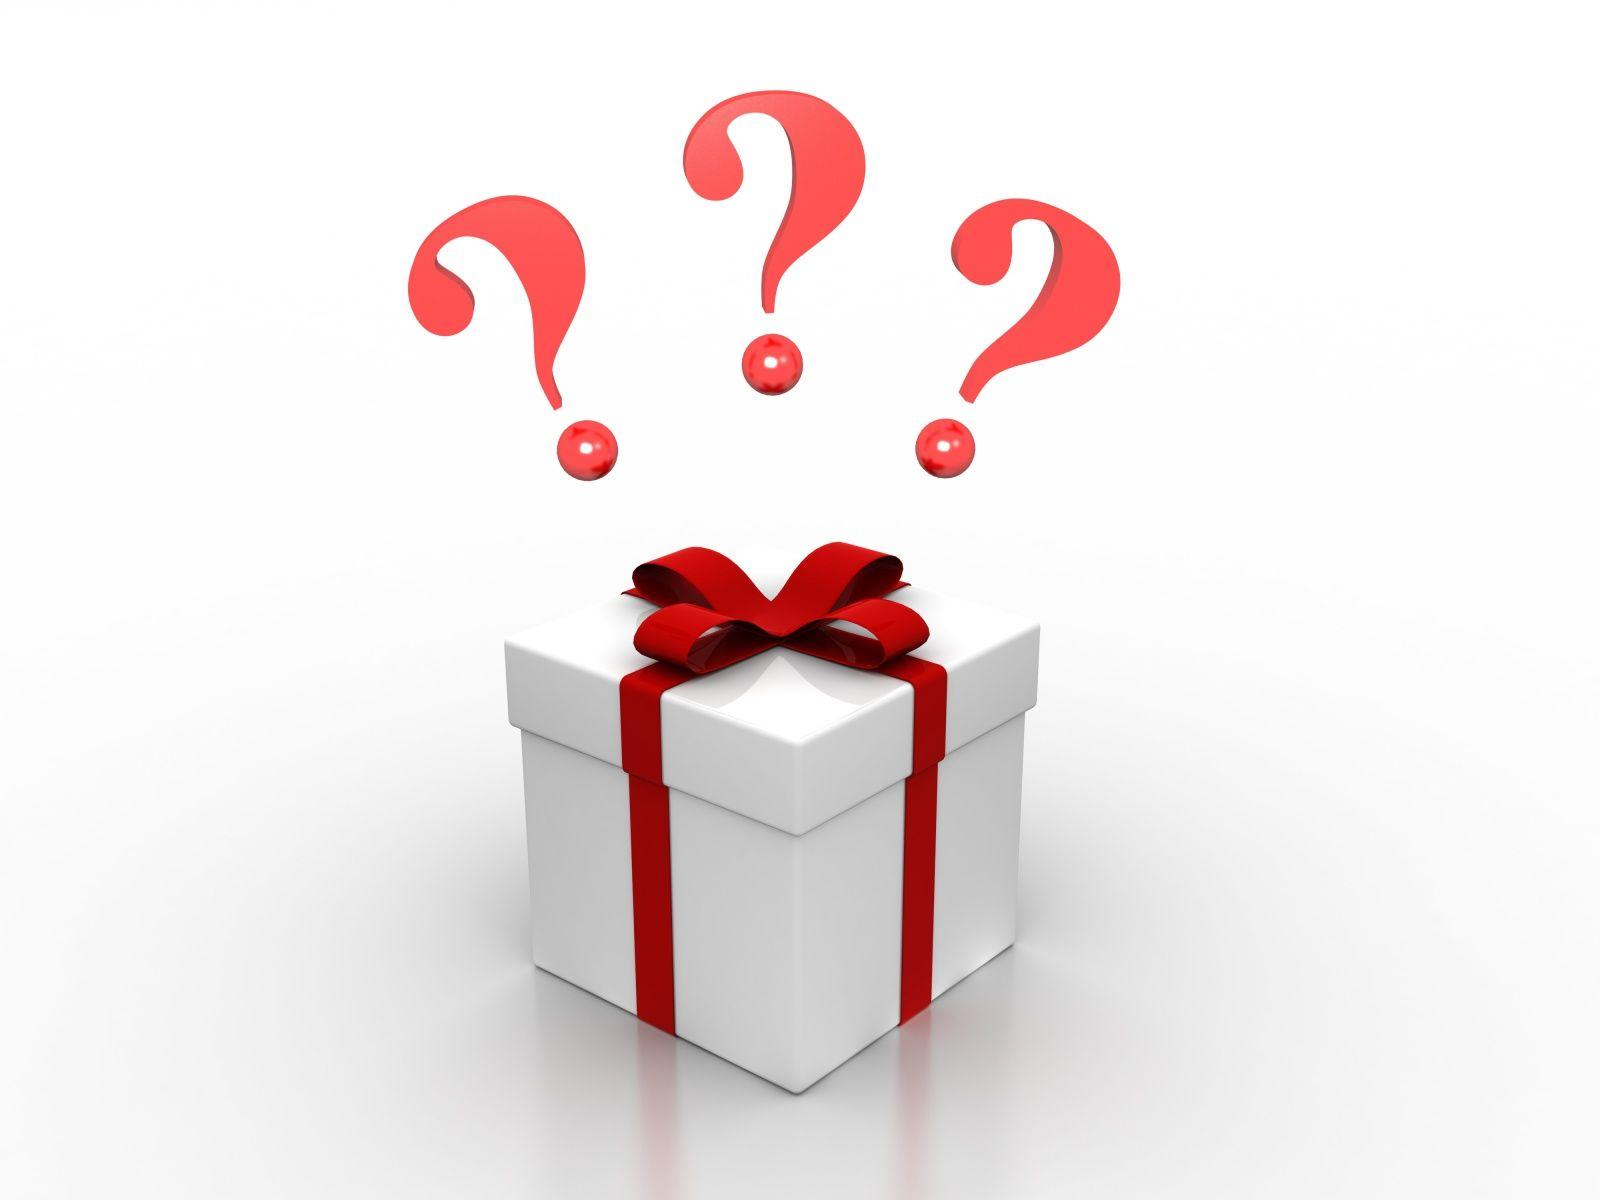 Подарок педагогу – подхалимство?